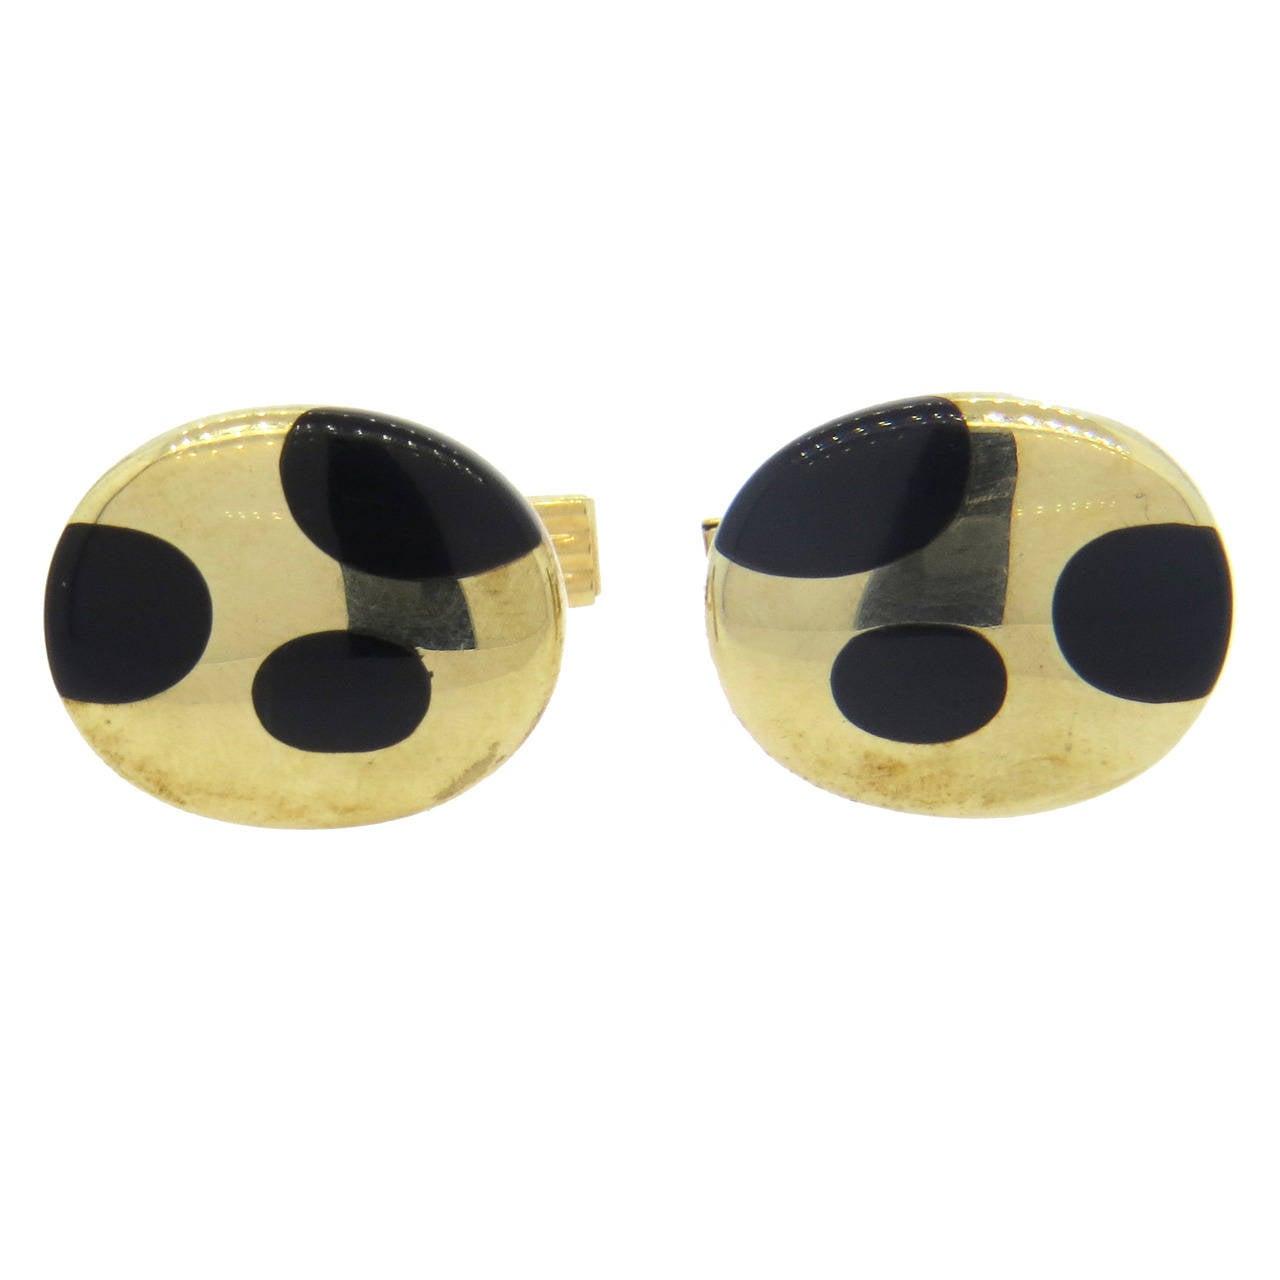 Onyx Inlay Gold Oval Cufflinks